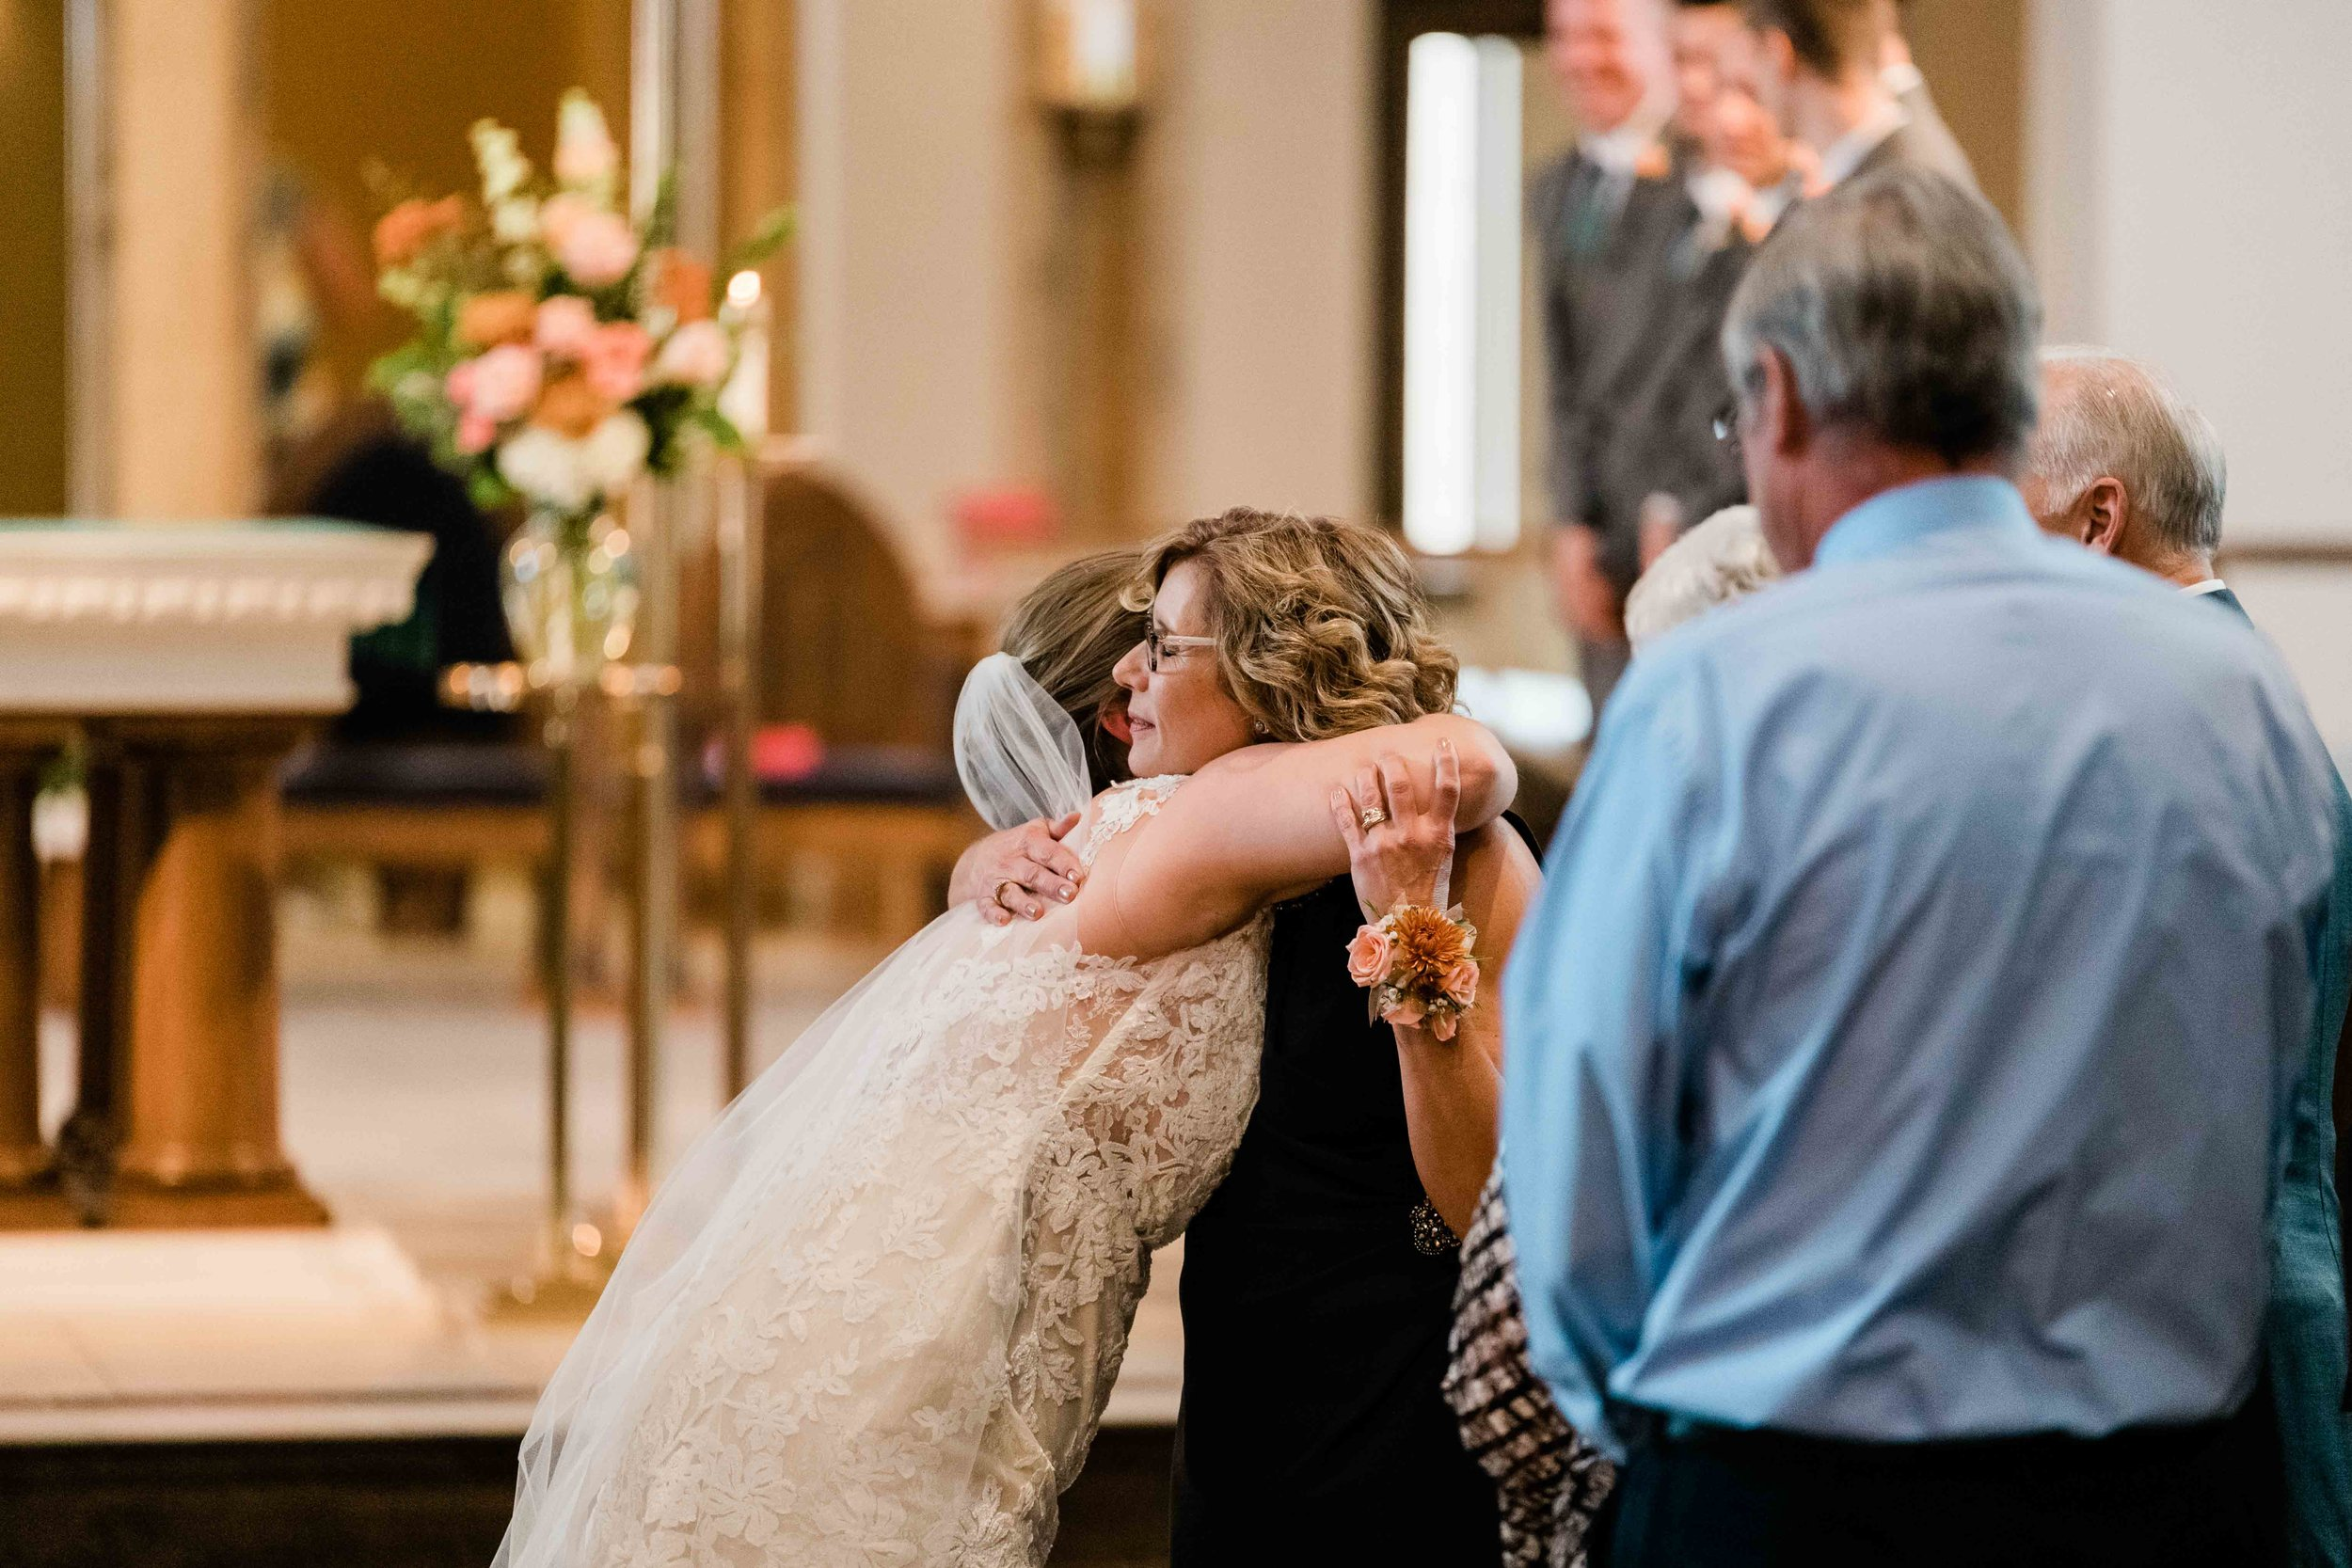 Bride hugs her new mother in law